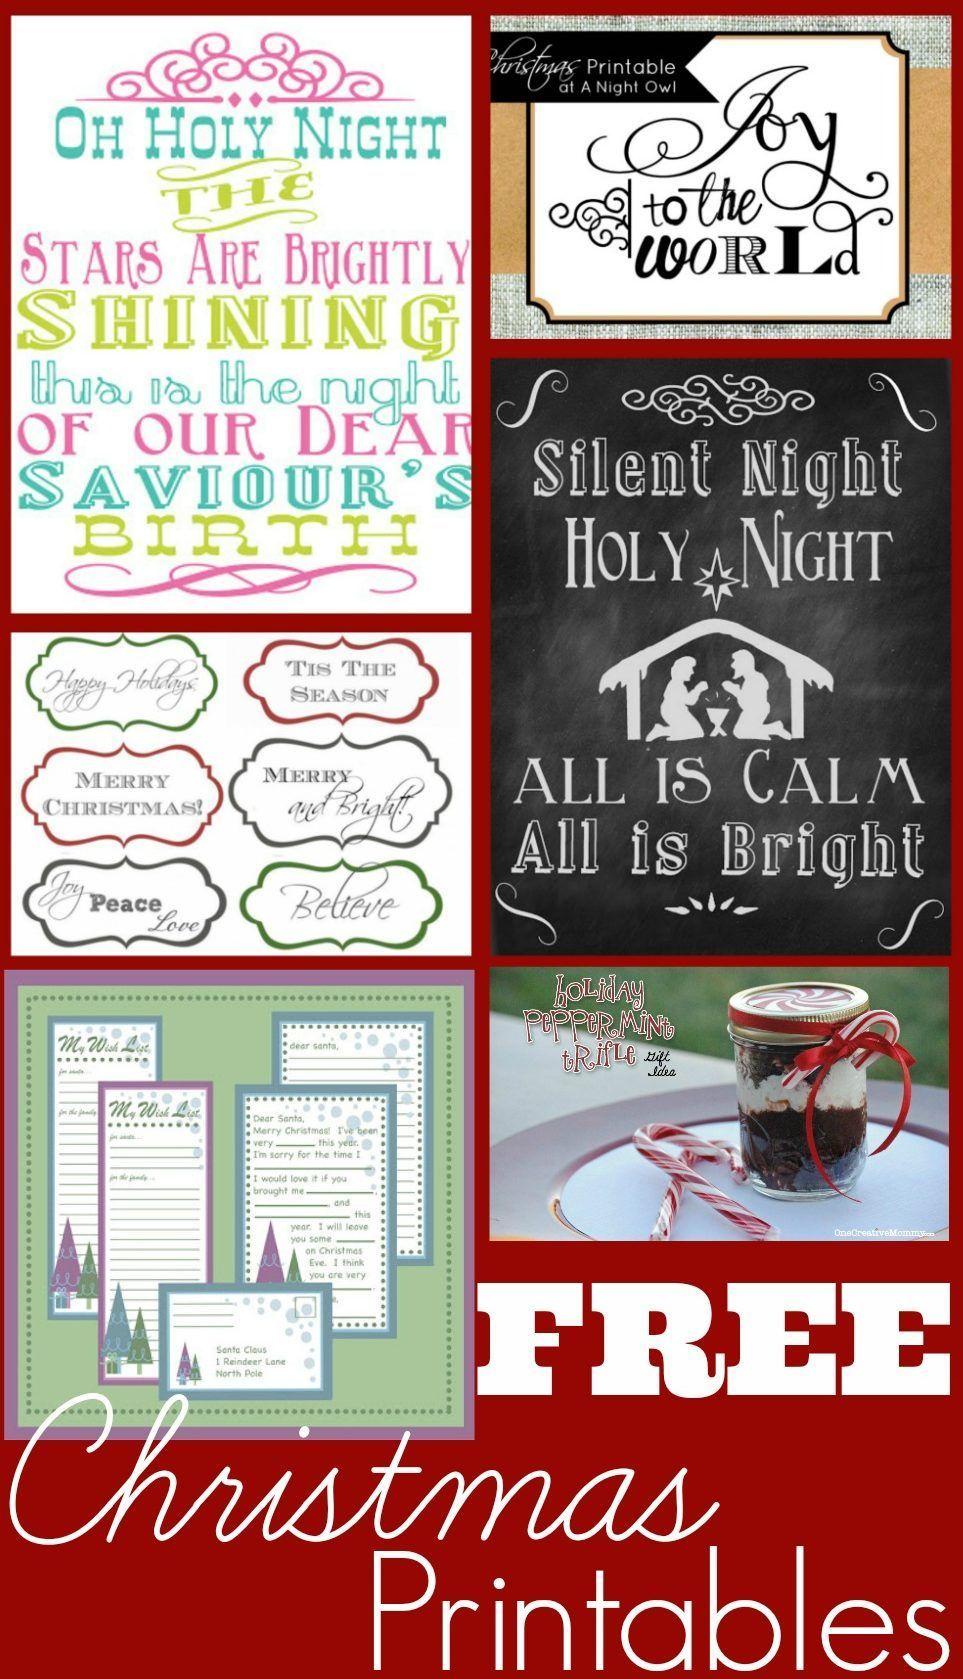 20 Free Christmas Printables In 2020 Free Christmas Printables Christmas Gift Tags Printable Free Christmas